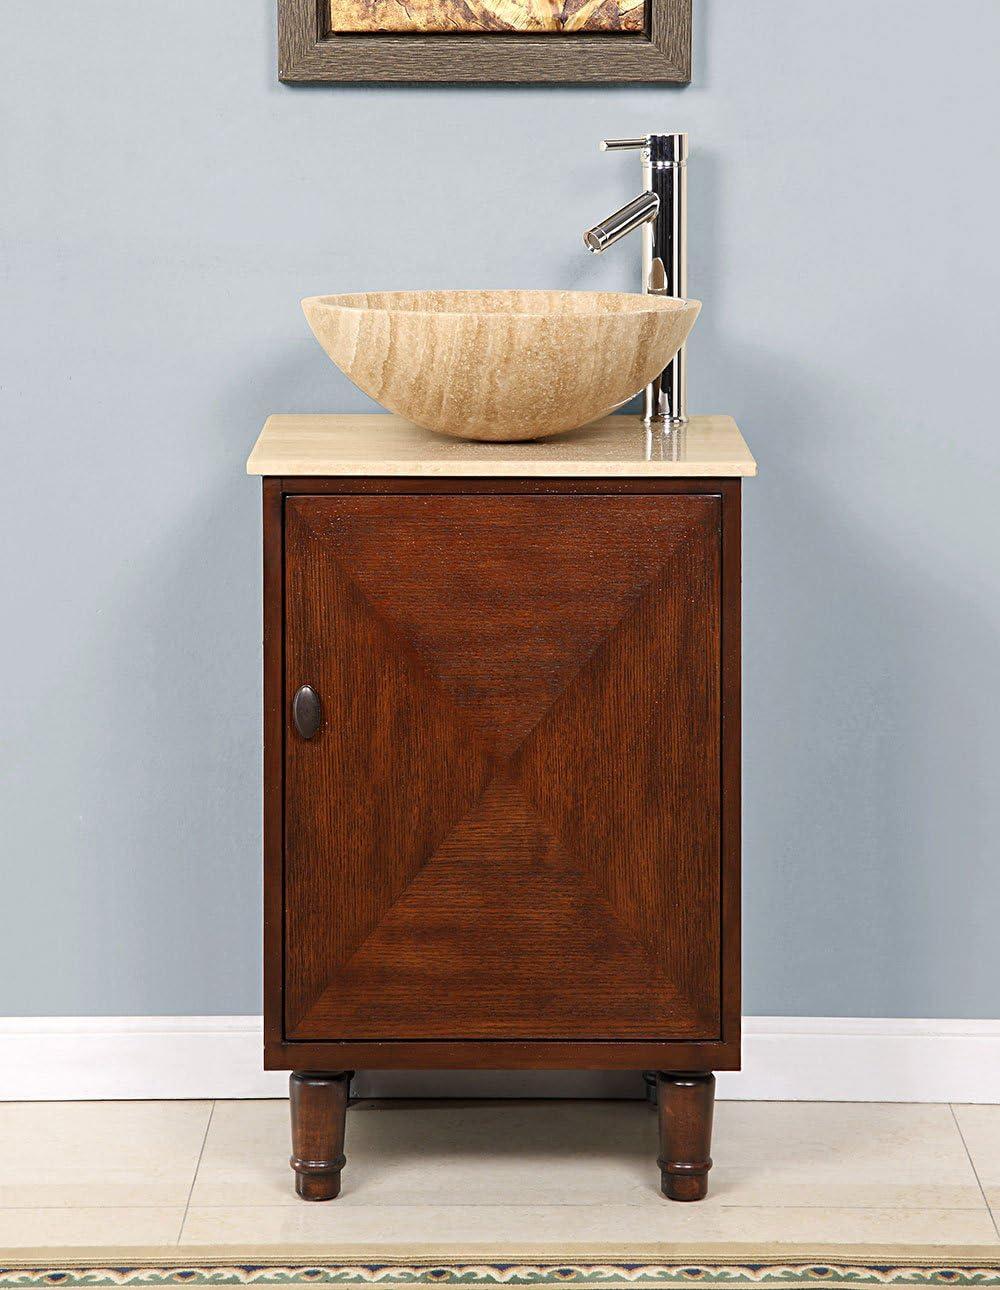 20 Single Sink Travertine Top Bathroom Vanity Cabinet Lavatory Furniture 225T